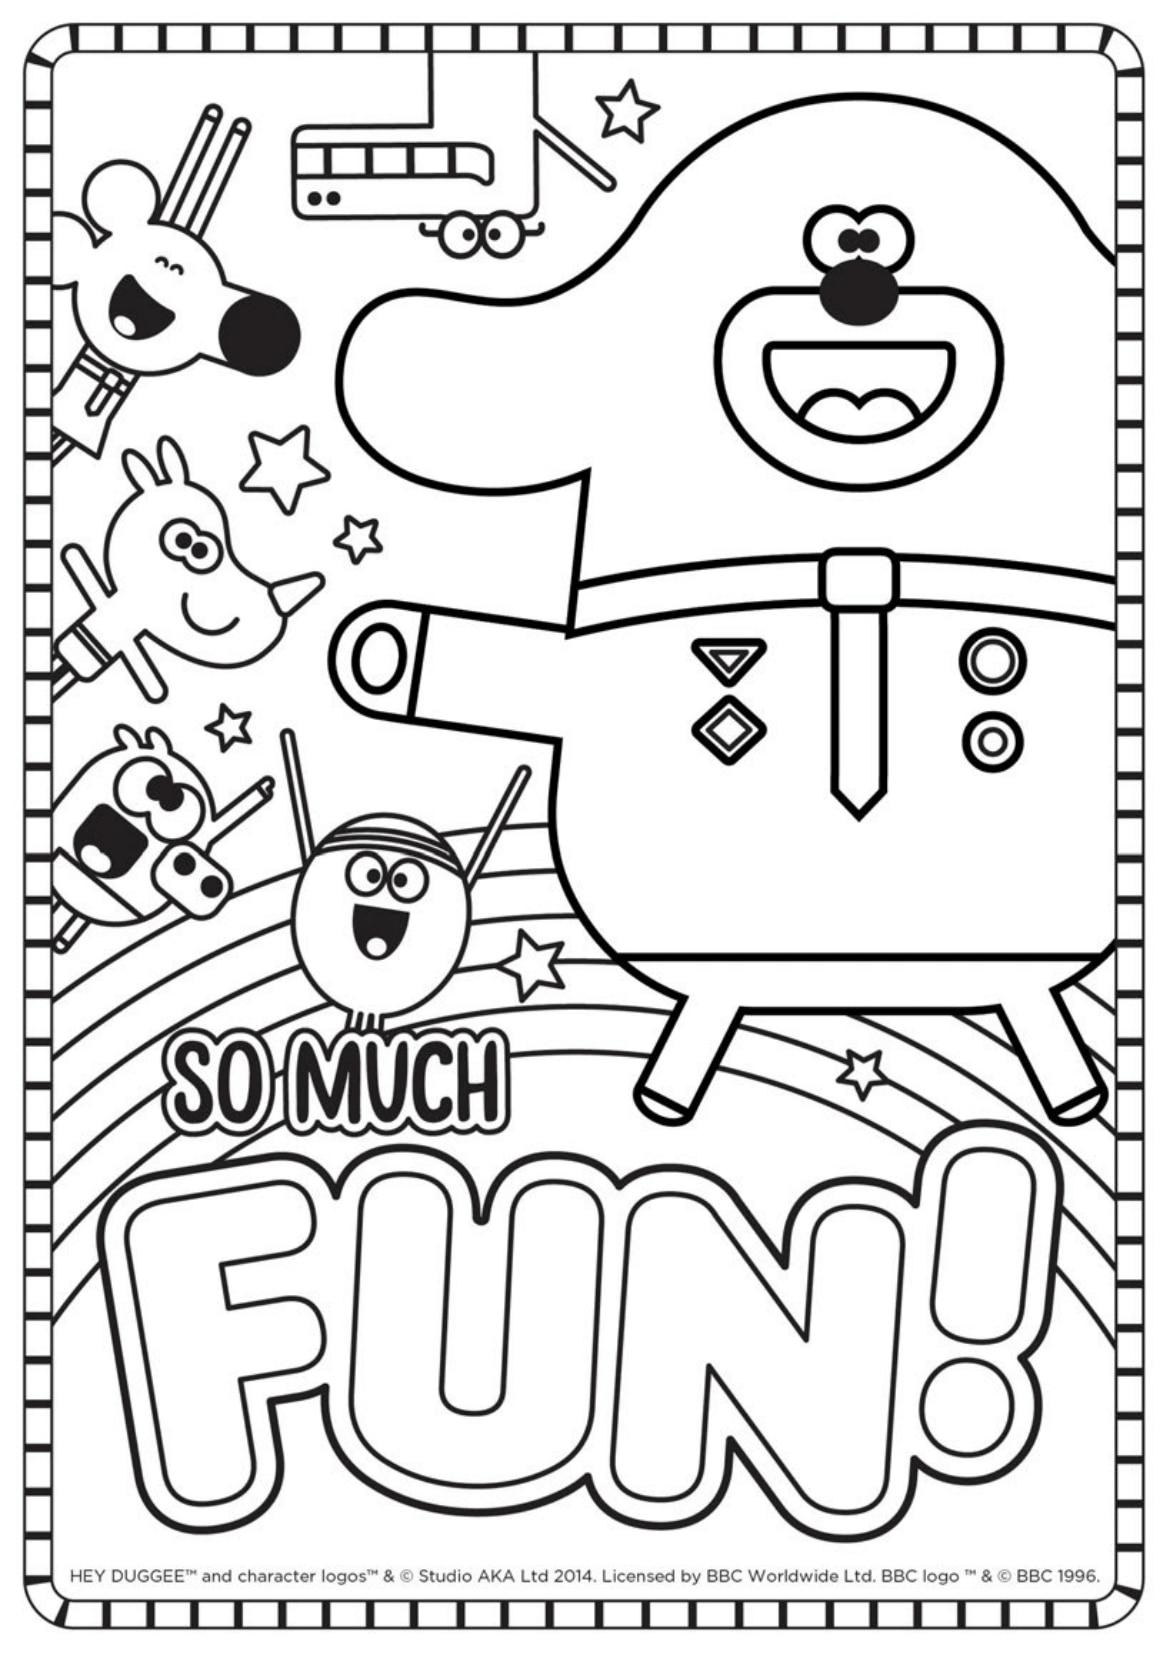 Fun Colouring Sheet